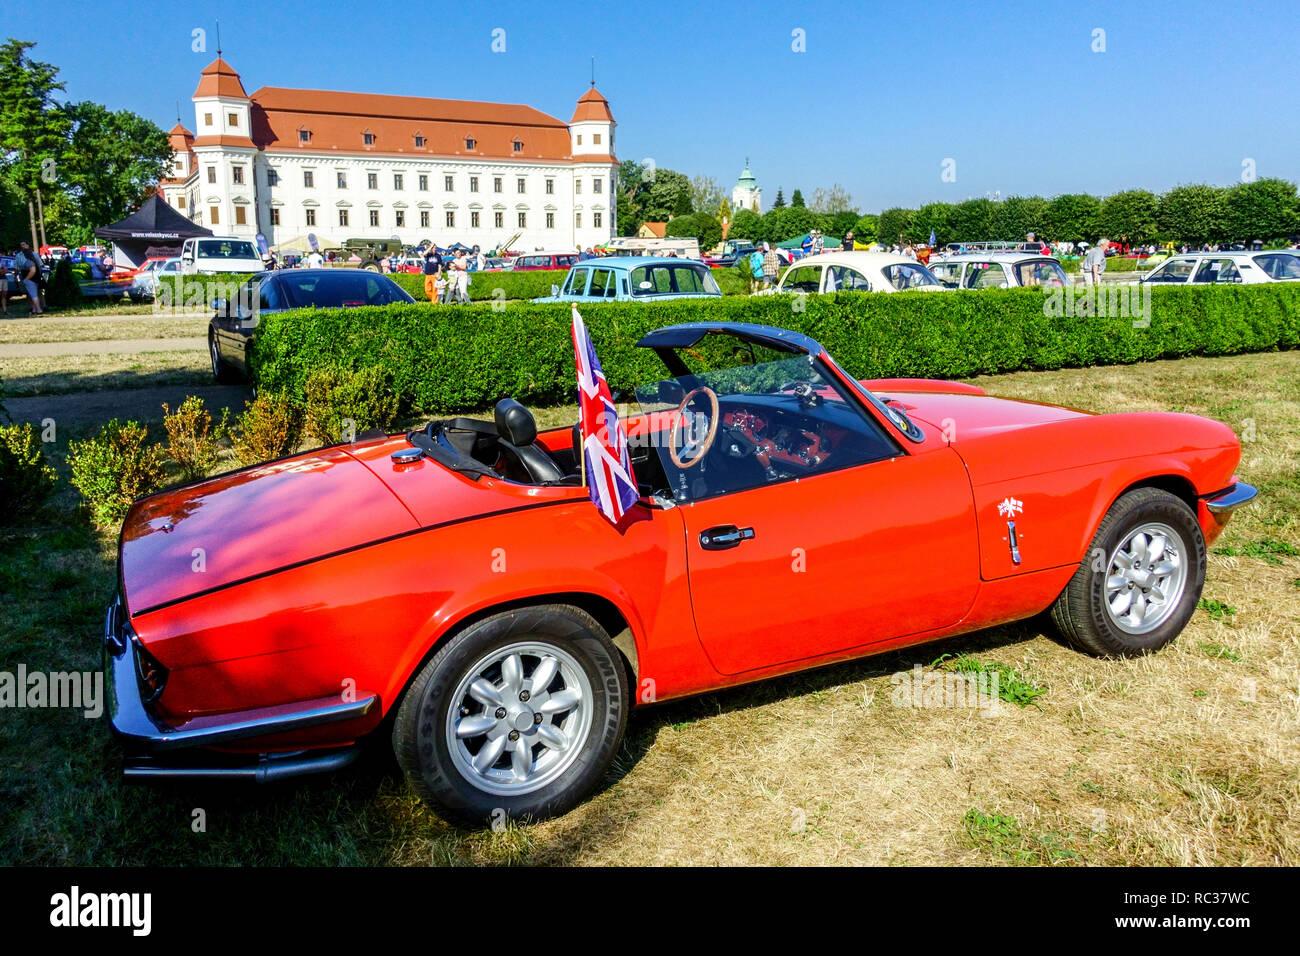 Triumph Spitfire 1500. 1970s, Holesov Castle garden, Czech Republic - Stock Image